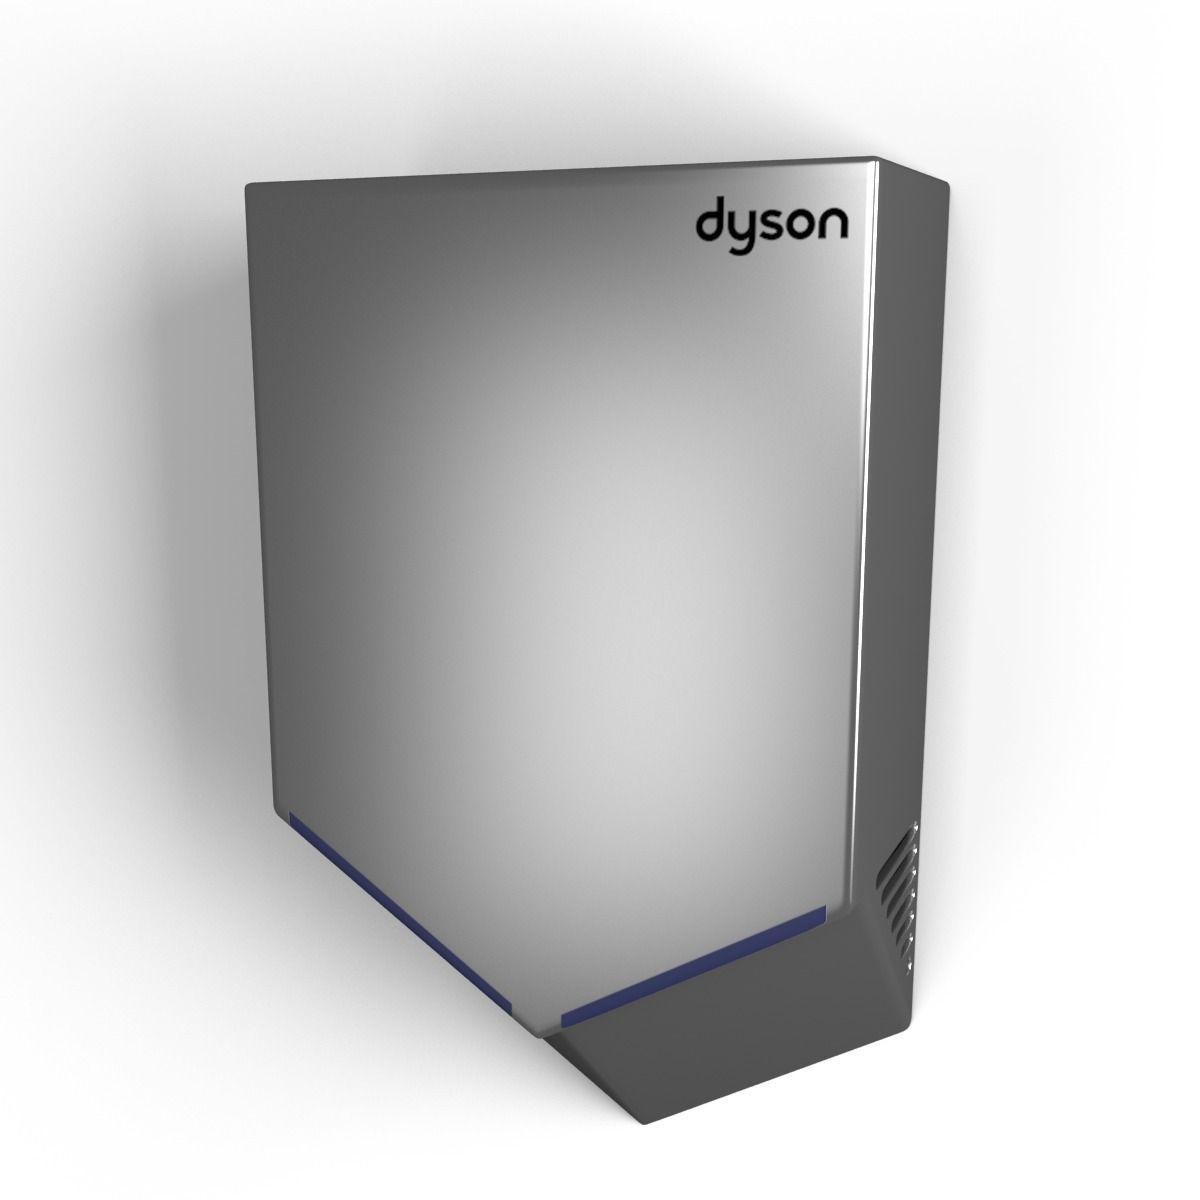 Dyson airblade 3d model animal dyson dc25